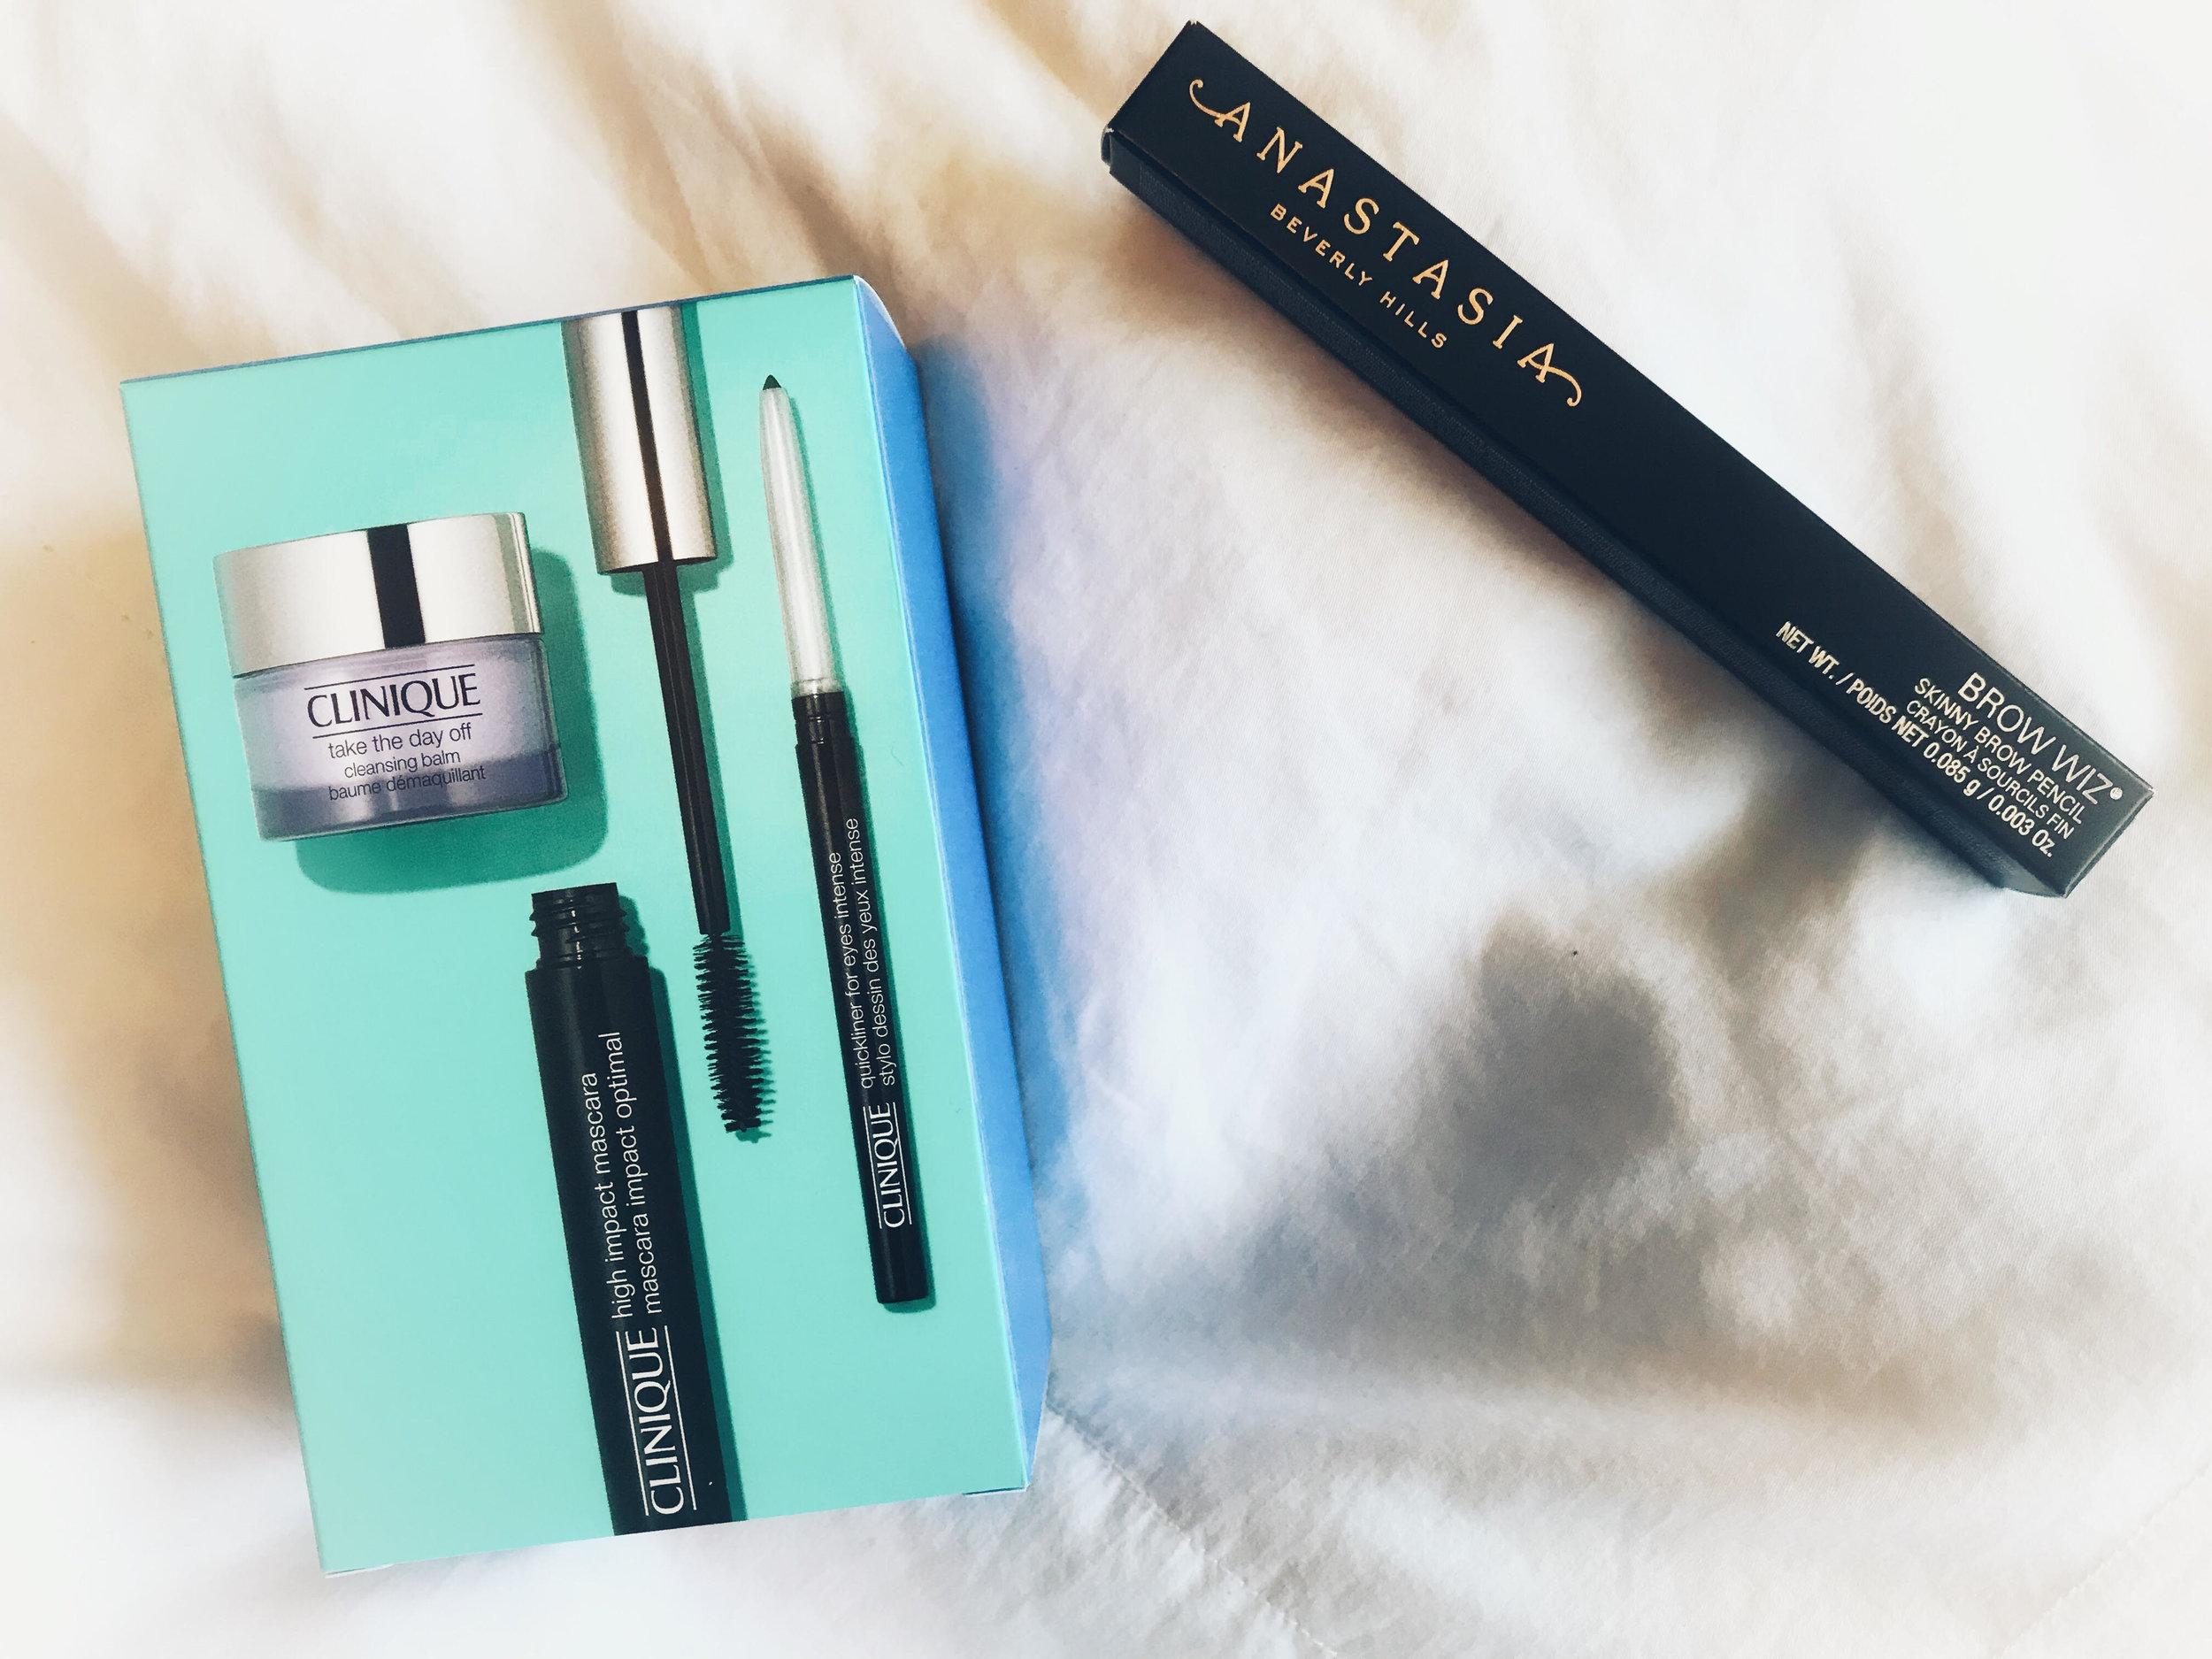 3. Beauty Deals - Took advantage of half-off deals during Ulta's 21 Days of Beauty Event (March 17 - April 6).Clinique Hi Impact Favorites Kit : $12.50 (reg. $25)Anastasia Beverly Hills Brow Wiz: $10.50(reg. $21)